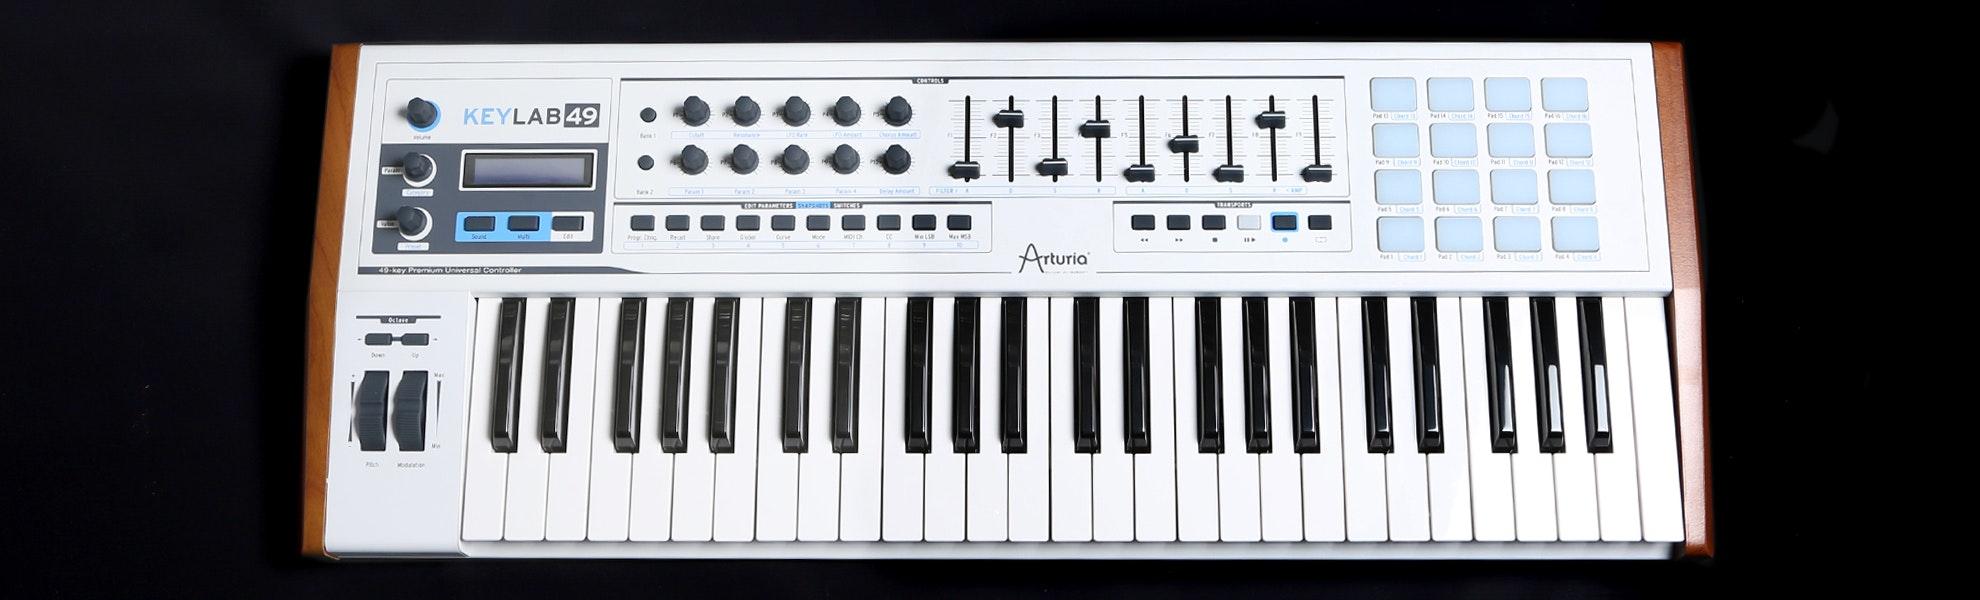 Arturia Keylab 49 Hybrid Synthesizer Producer Pack